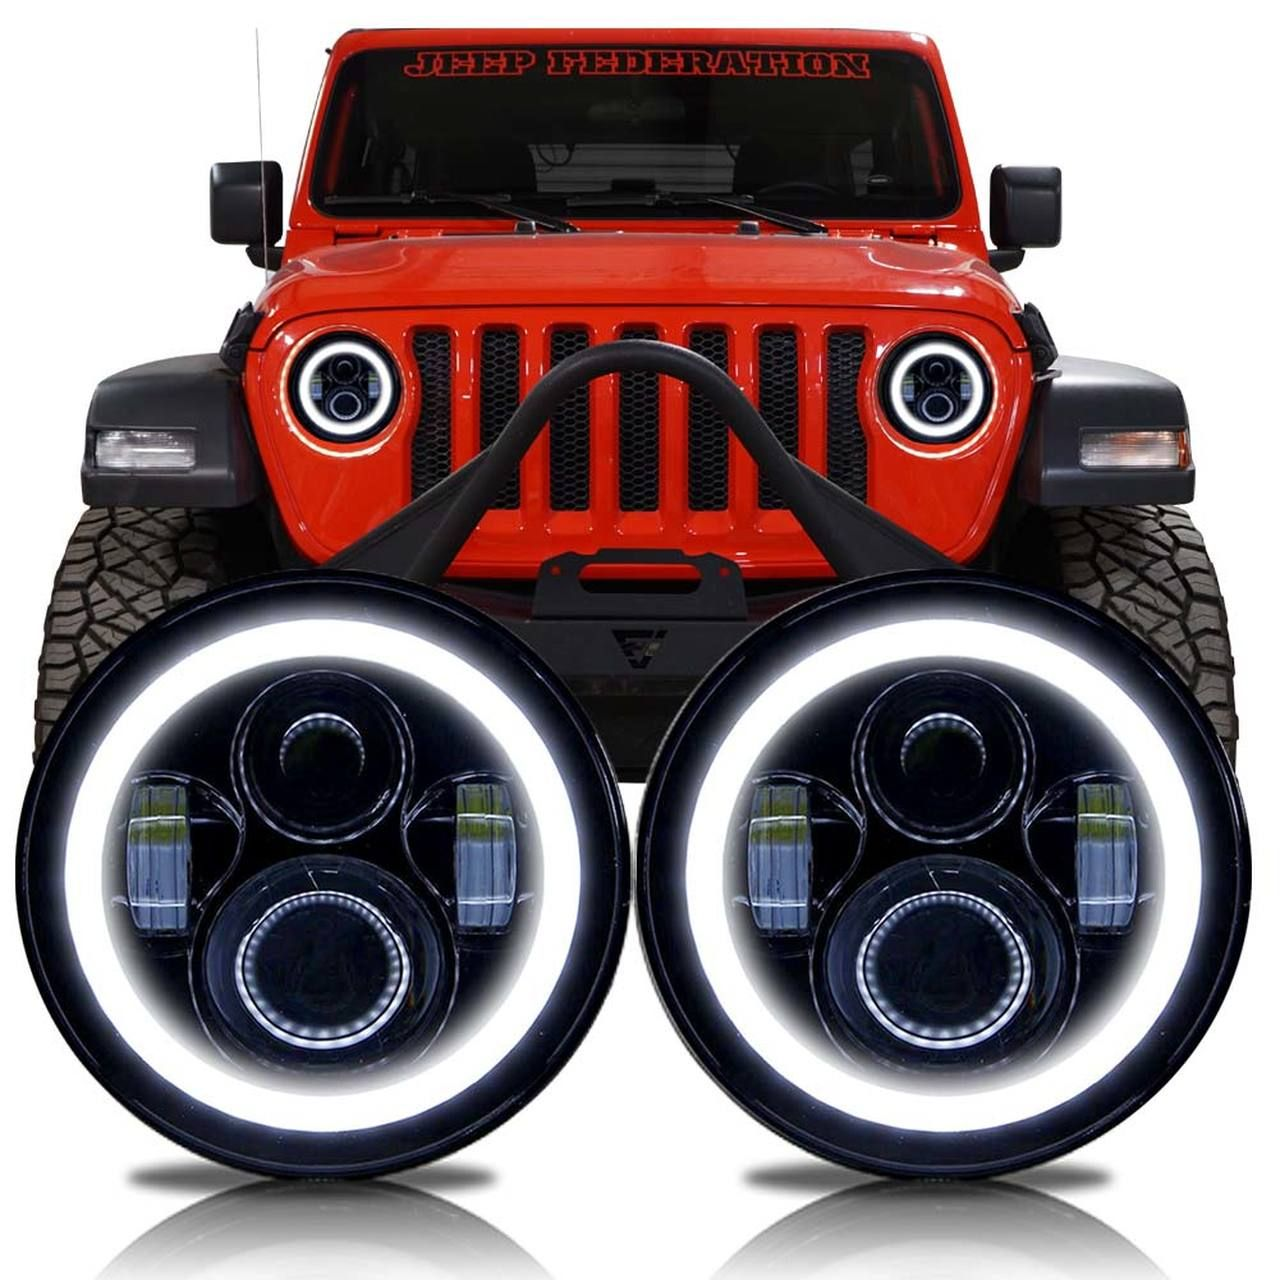 Halo Projector Black Led Headlights For Wrangler Jl Gladiator